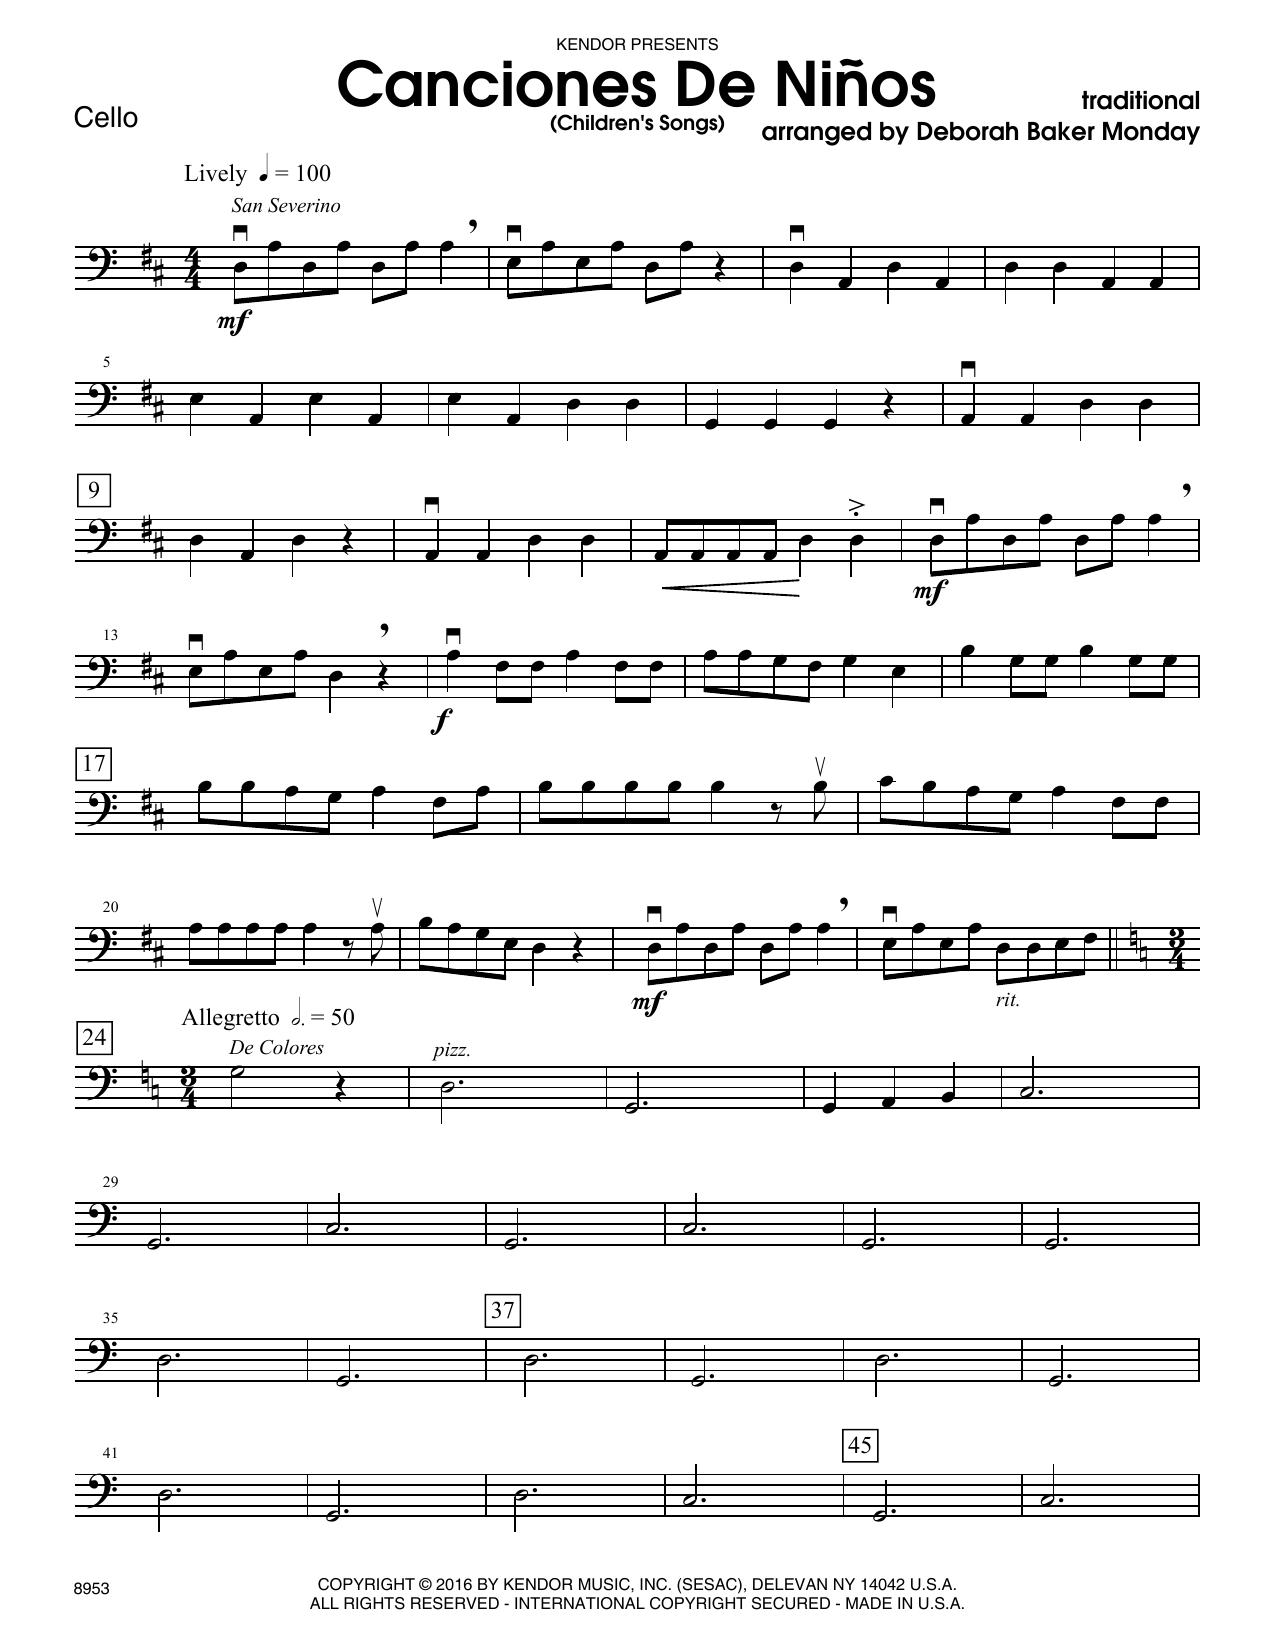 Deborah Baker Monday Canciones De Ninos - Cello sheet music notes and chords. Download Printable PDF.